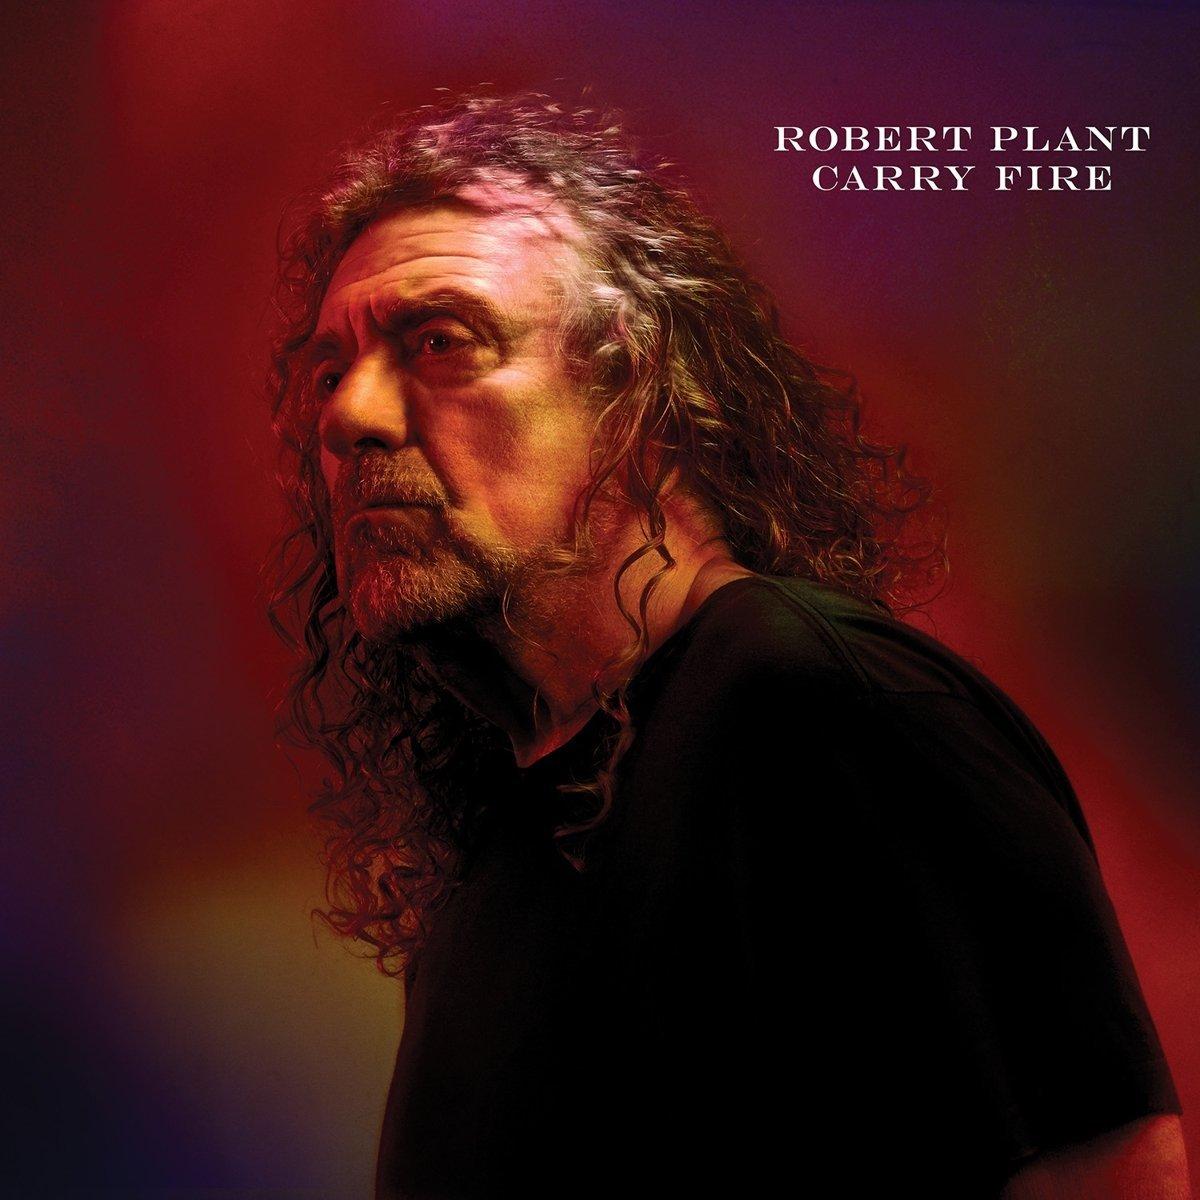 Carry Fire – Vinyl LP - Robert Plant